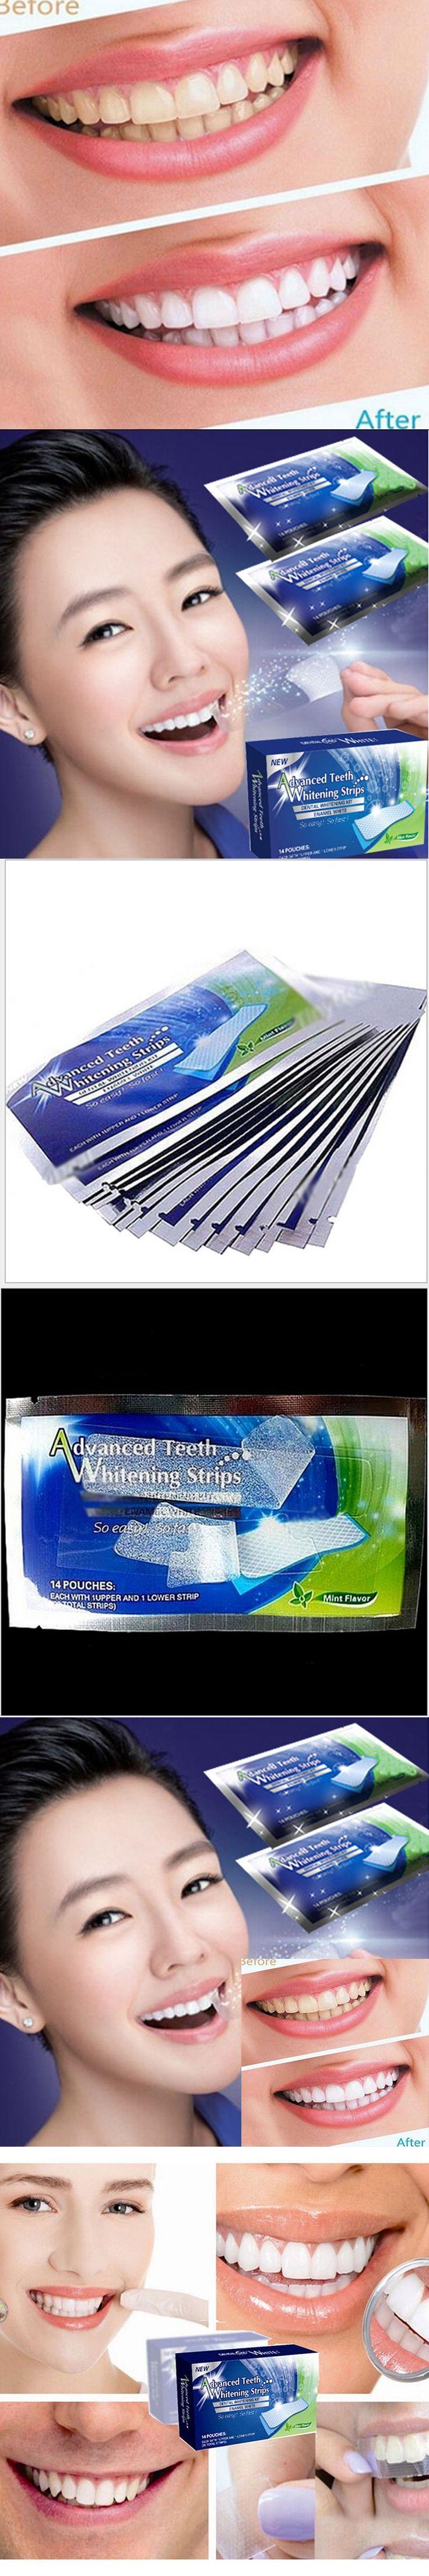 1pcs New Teeth Whitening Strips Gel Care Oral Hygiene Clareador Dental Bleaching Tooth Whitening Bleach Teeth Whiten Tools H0018